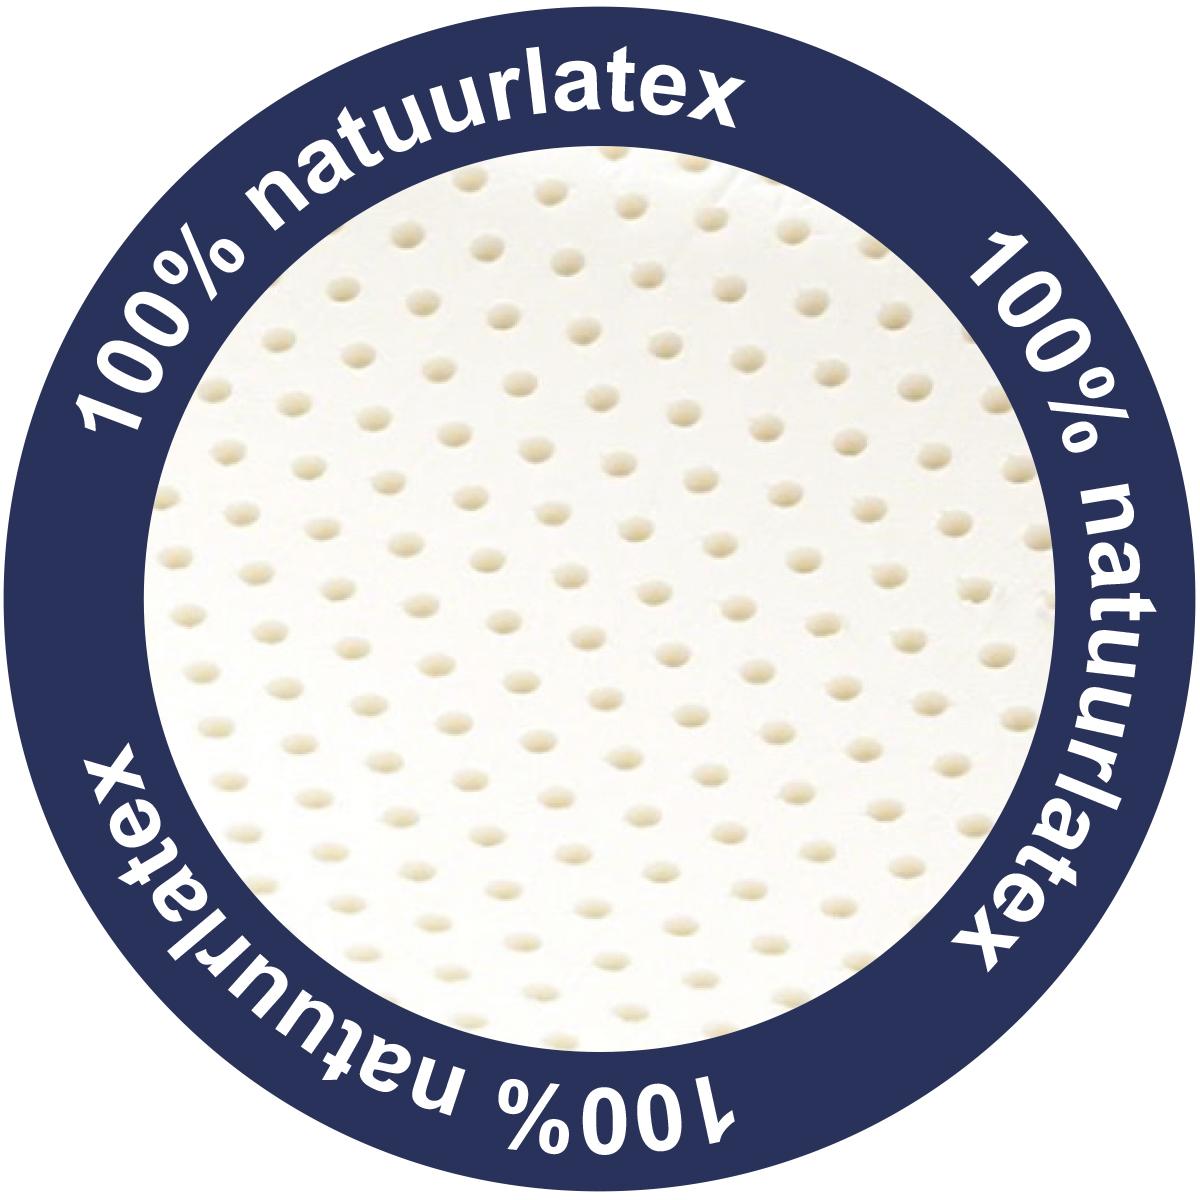 100% natuurlatex